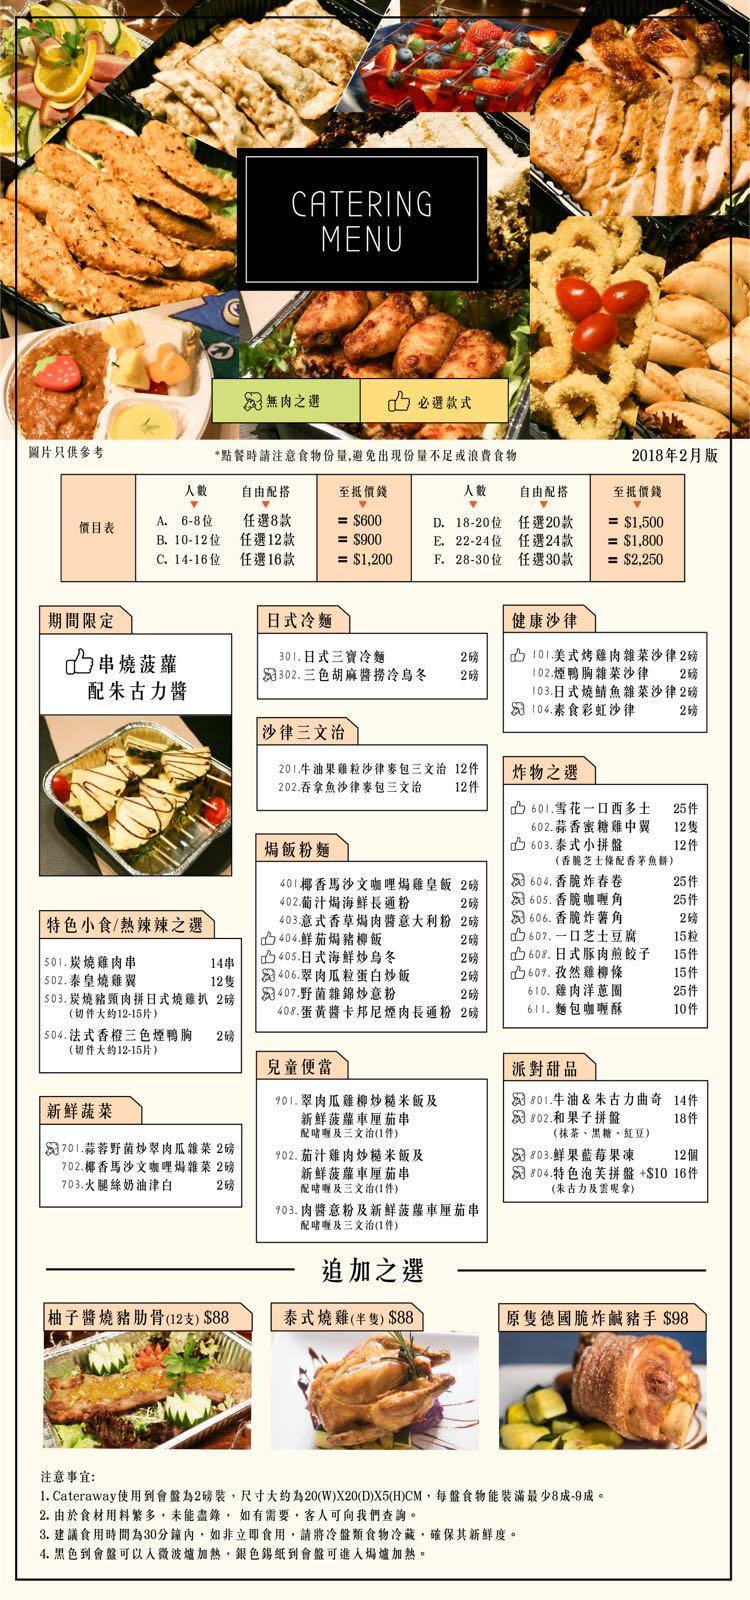 CATERING MENU 53無肉之選 1cb必選款式 圖片只供參考 *點餐時請注意食物份量,避免出現份量不足或浪費食物 2018年2月版 人數 自由配搭 人數自由配搭1至抵價錢 D. 18-2012 任選20款 1 = $1,500 E. 22-24位 任選24款 ! -$1,800 F. 28-30位 任選30款 1 =$2.250 價目表 ! A. 6-8位 任選8款 1 = $600 B. 10-12位 C. 14-16位 任選12款 任選16款 1 1 = $900 = $1.200 | 期間限定) 日式冷麵) 健康沙律 2磅! 2磅 Icb 101,美式烤雞肉雜菜沙律2磅 102煙鴨胸雜菜沙律 2磅 03日式燒鯖魚雜菜沙律2磅 04,素食彩虹沙律 2磅 串燒菠蘿 配朱古力醬 301,日式三寶冷麵 3:02.三色胡麻醬撈冷烏冬 ! 沙律三文治 201牛油果雞粒沙律麥包三文治12件| 202吞拿魚沙律麥包三文治 12件 |炸物之選 、 山601.雪花一口酉多士 602.蒜香蜜糖雞中翼 25件 12隻 12件 山603,泰式小拼盤 604 香脆炸春卷 153 606,香脆炸薯角 |cb609,孜然雞柳條 焗飯粉麵 (香脆芝士條配香茅魚影 40 椰香馬沙文咖哩焗雞皇飯2磅1 402葡汁焗海鮮長通粉 2H | | rd 605香脆咖喱角 403 意式香草焗肉醬意大利粉2磅1 Ib404鮮茄焗猪柳飯 特色小食/熱辣辣之選- 2磅11 2磅11山608.日式豚肉煎餃子 29 | 607,一口芝士豆腐 15粒 10凸40s.日式海鮮炒烏冬 1853406 翠肉瓜粒蛋白炒飯 1853 407野菌雜錦炒意粉 15件 15件 14串1 12隻1 s03.炭燒豬頸肉拼日式燒雞扒2磅1 501.炭燒雞肉串 502,泰皇燒雞翼 610,雞肉洋蔥圈 611·麵包咖喱酥 408,蛋黃醬卡邦尼煙肉長通粉 2磅 10件 504、法式香橙三色煙鴨胸 (切件大約12-15%) 2磅 兒童便當) 派對甜品 801牛油&朱古力曲奇 802 和果子拼盤 101 翠肉瓜雞柳炒糙米飯及 新鮮蔬菜 14件 18件 新鮮菠蘿車厘茄串 配啫喱及三文治(1件) 902,茄汁雞肉炒糙米飯及 新鮮菠蘿車厘茄串 (抹茶、黑糖、紅豆) 7t701.蒜蓉野菌炒翠肉瓜雜菜2磅11 702椰香馬沙文咖哩焗,food,recipe,